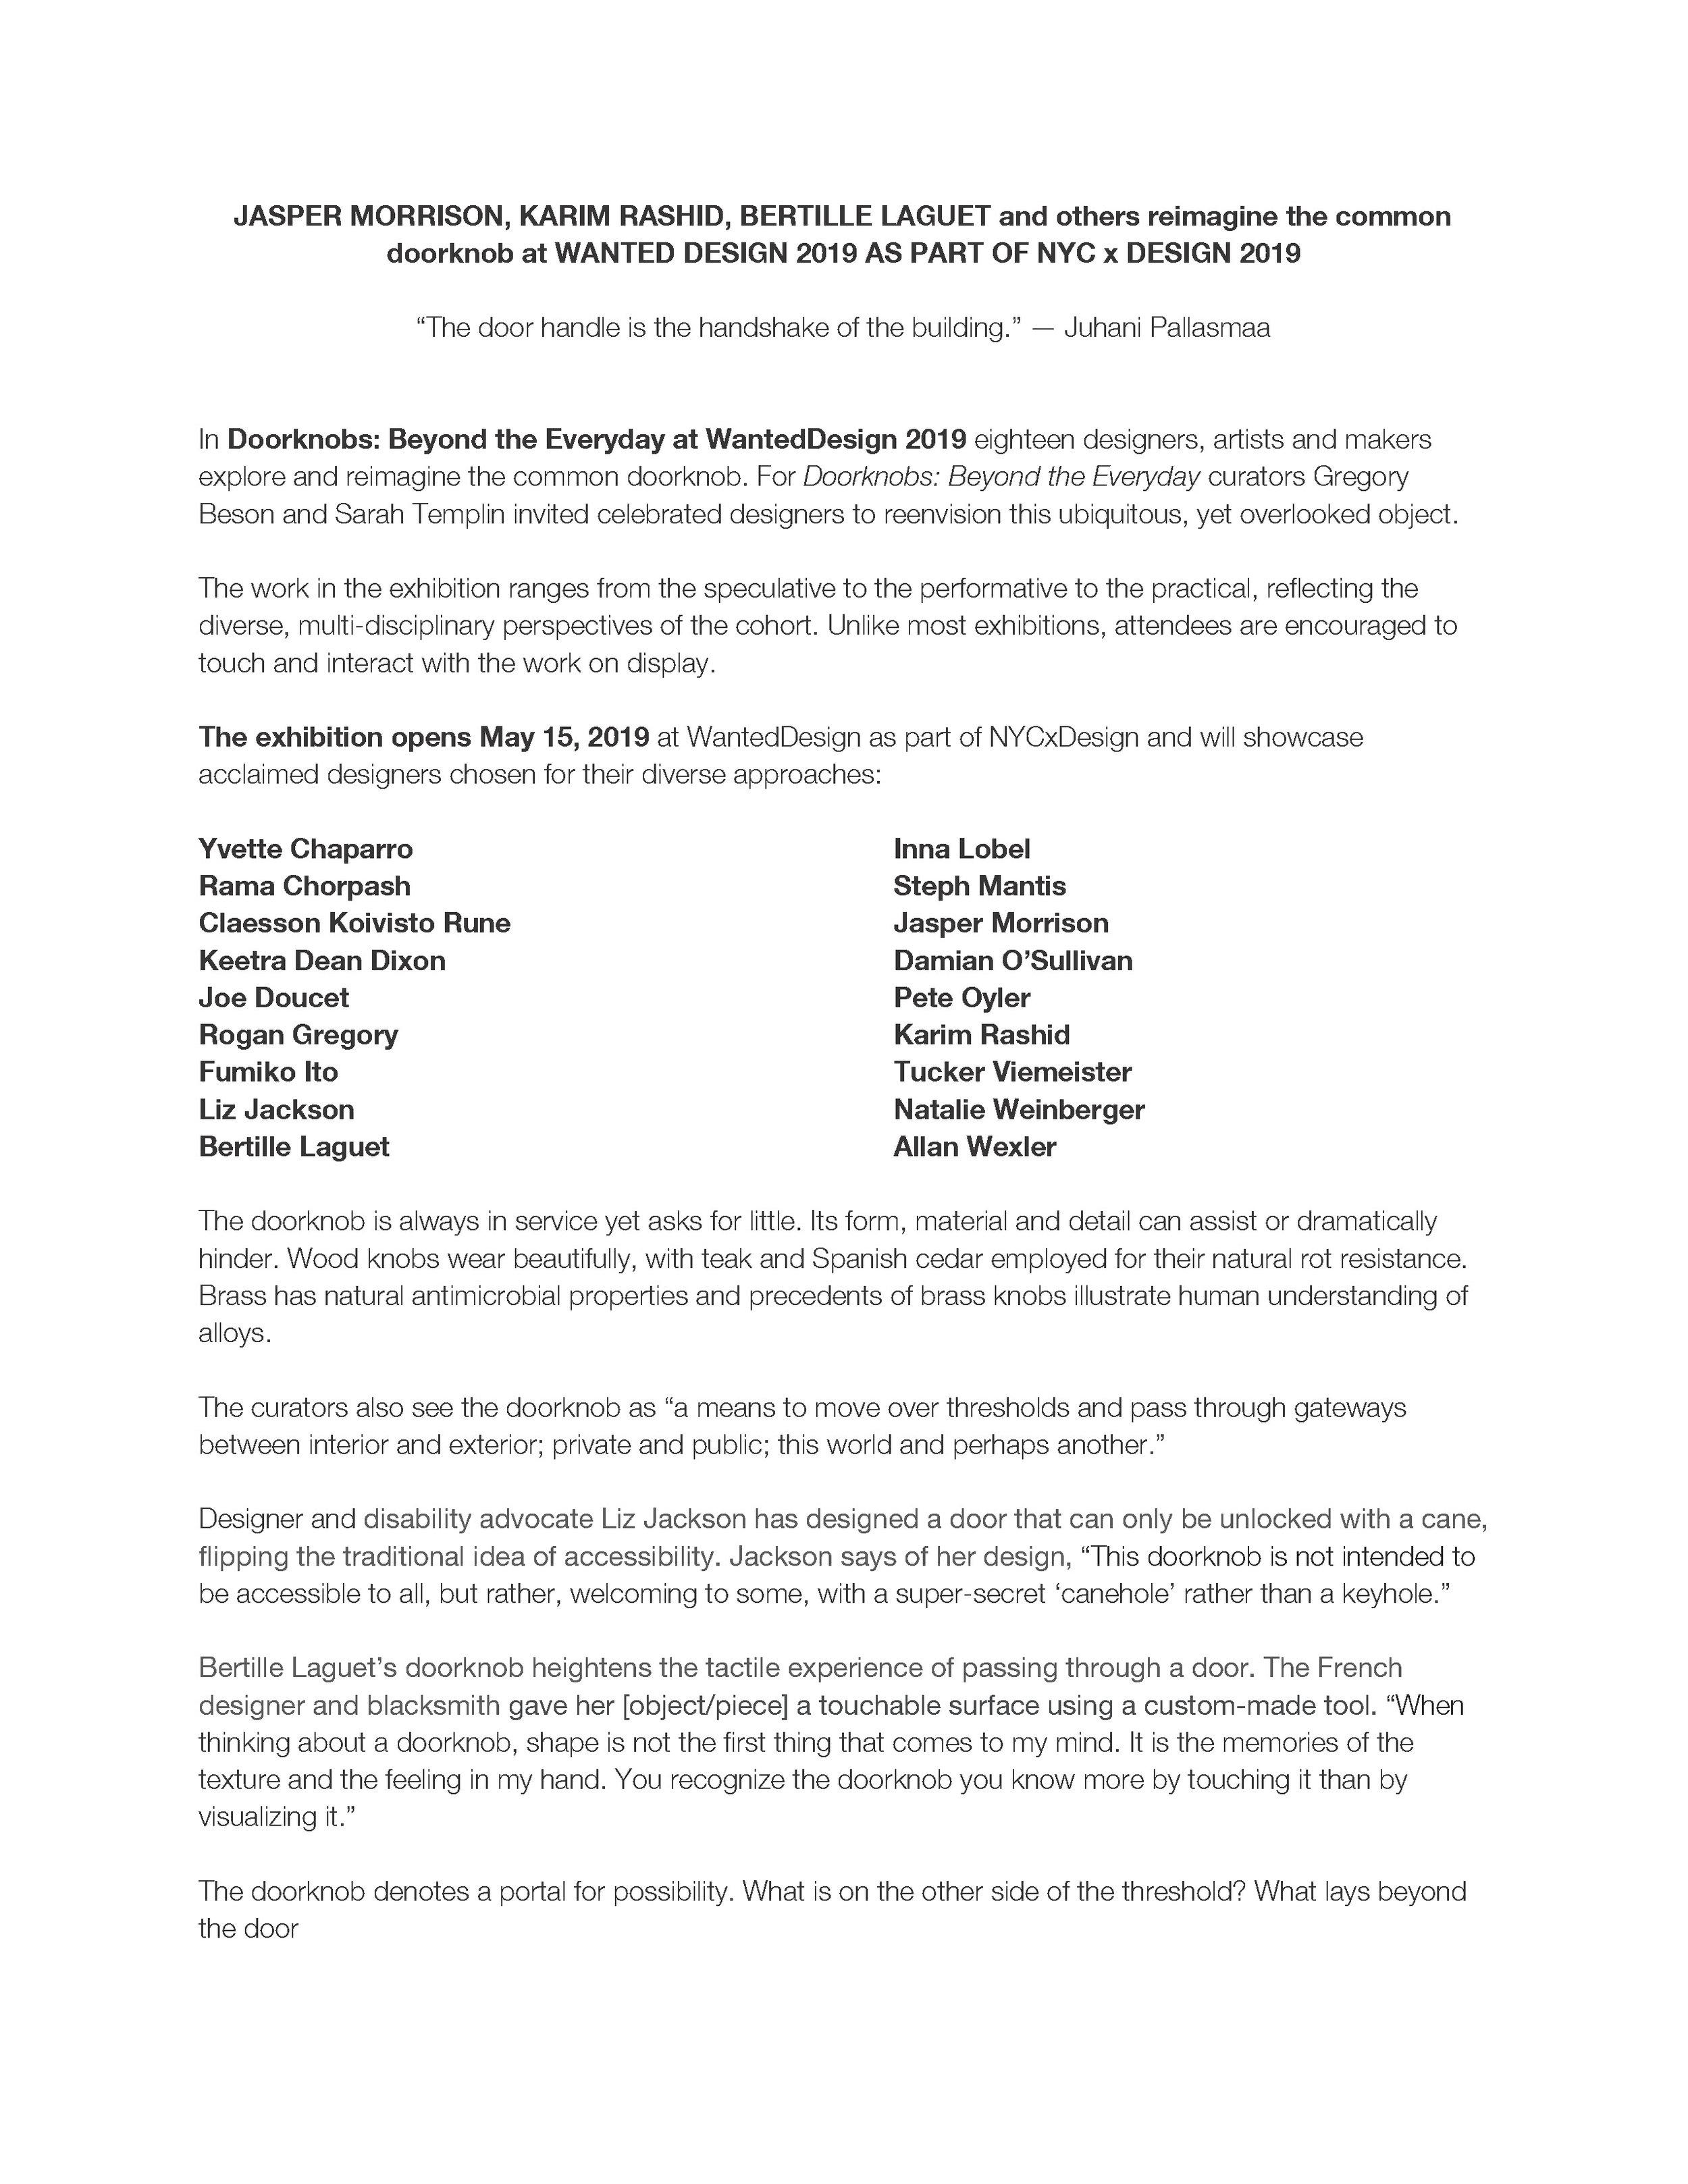 press release 2019_Page_1.jpg